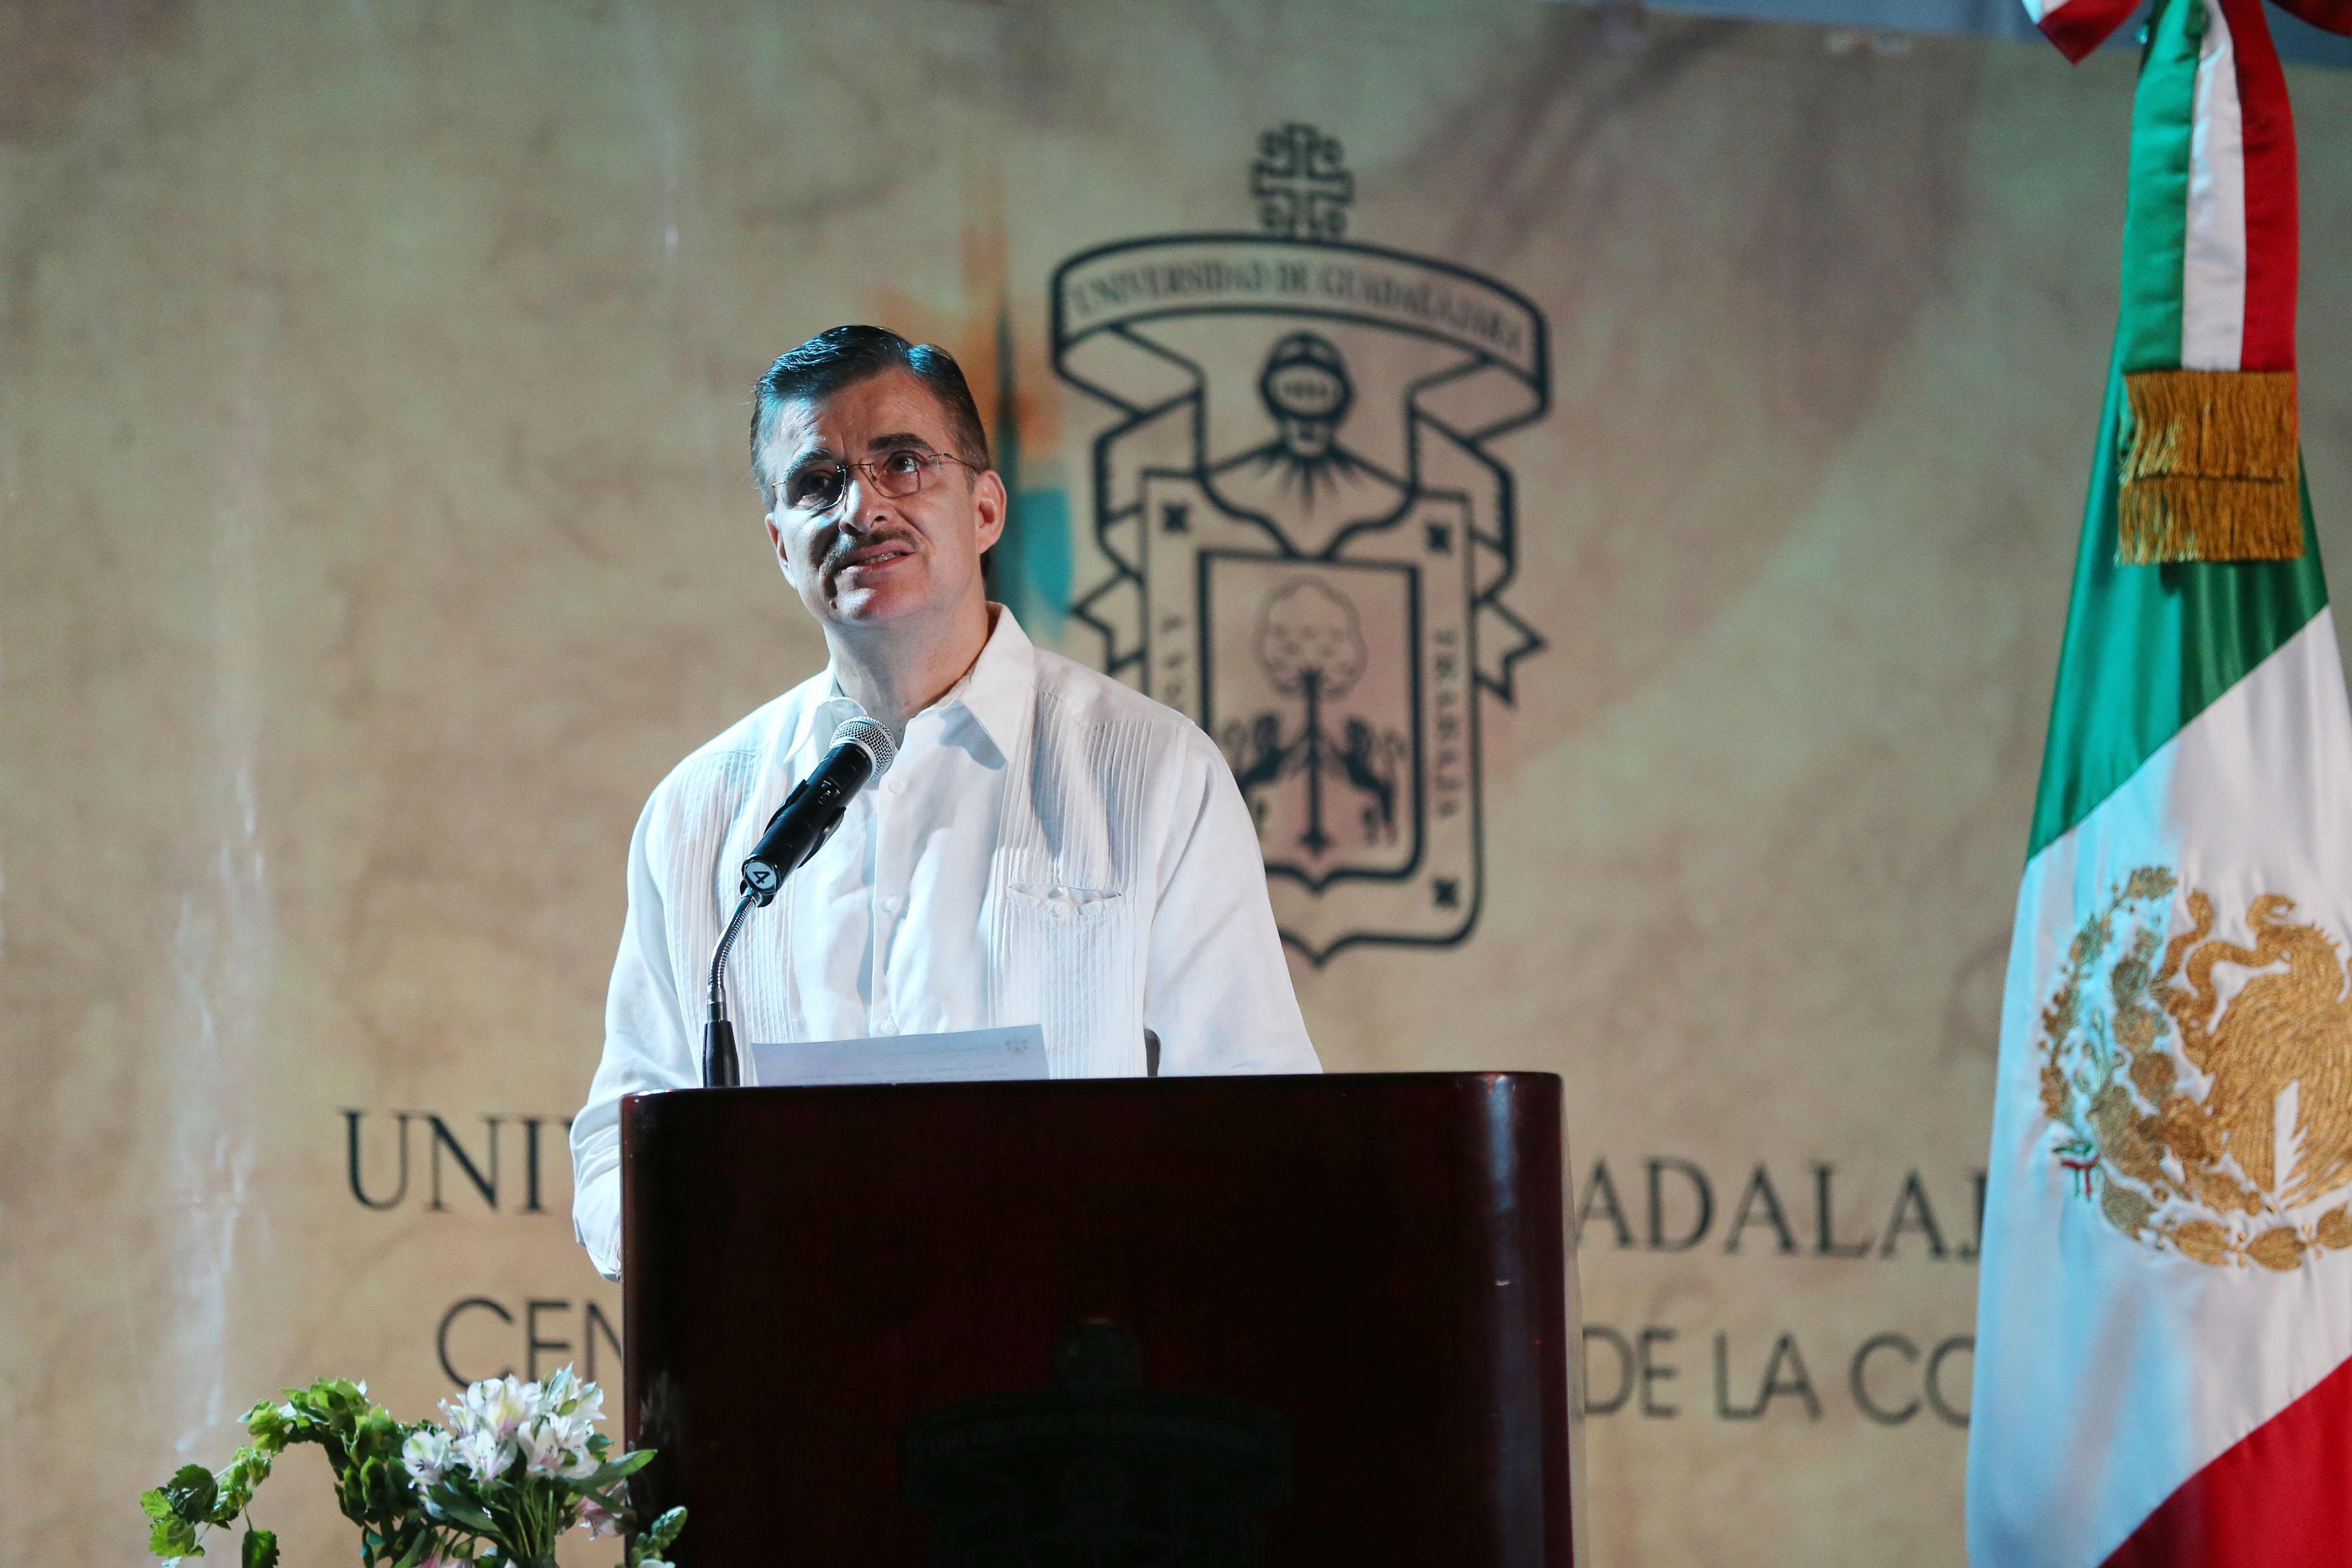 Rector General de la UdeG, maestro Itzcóatl Tonatiuh Bravo Padilla, en podium haciendo uso de la palabra.